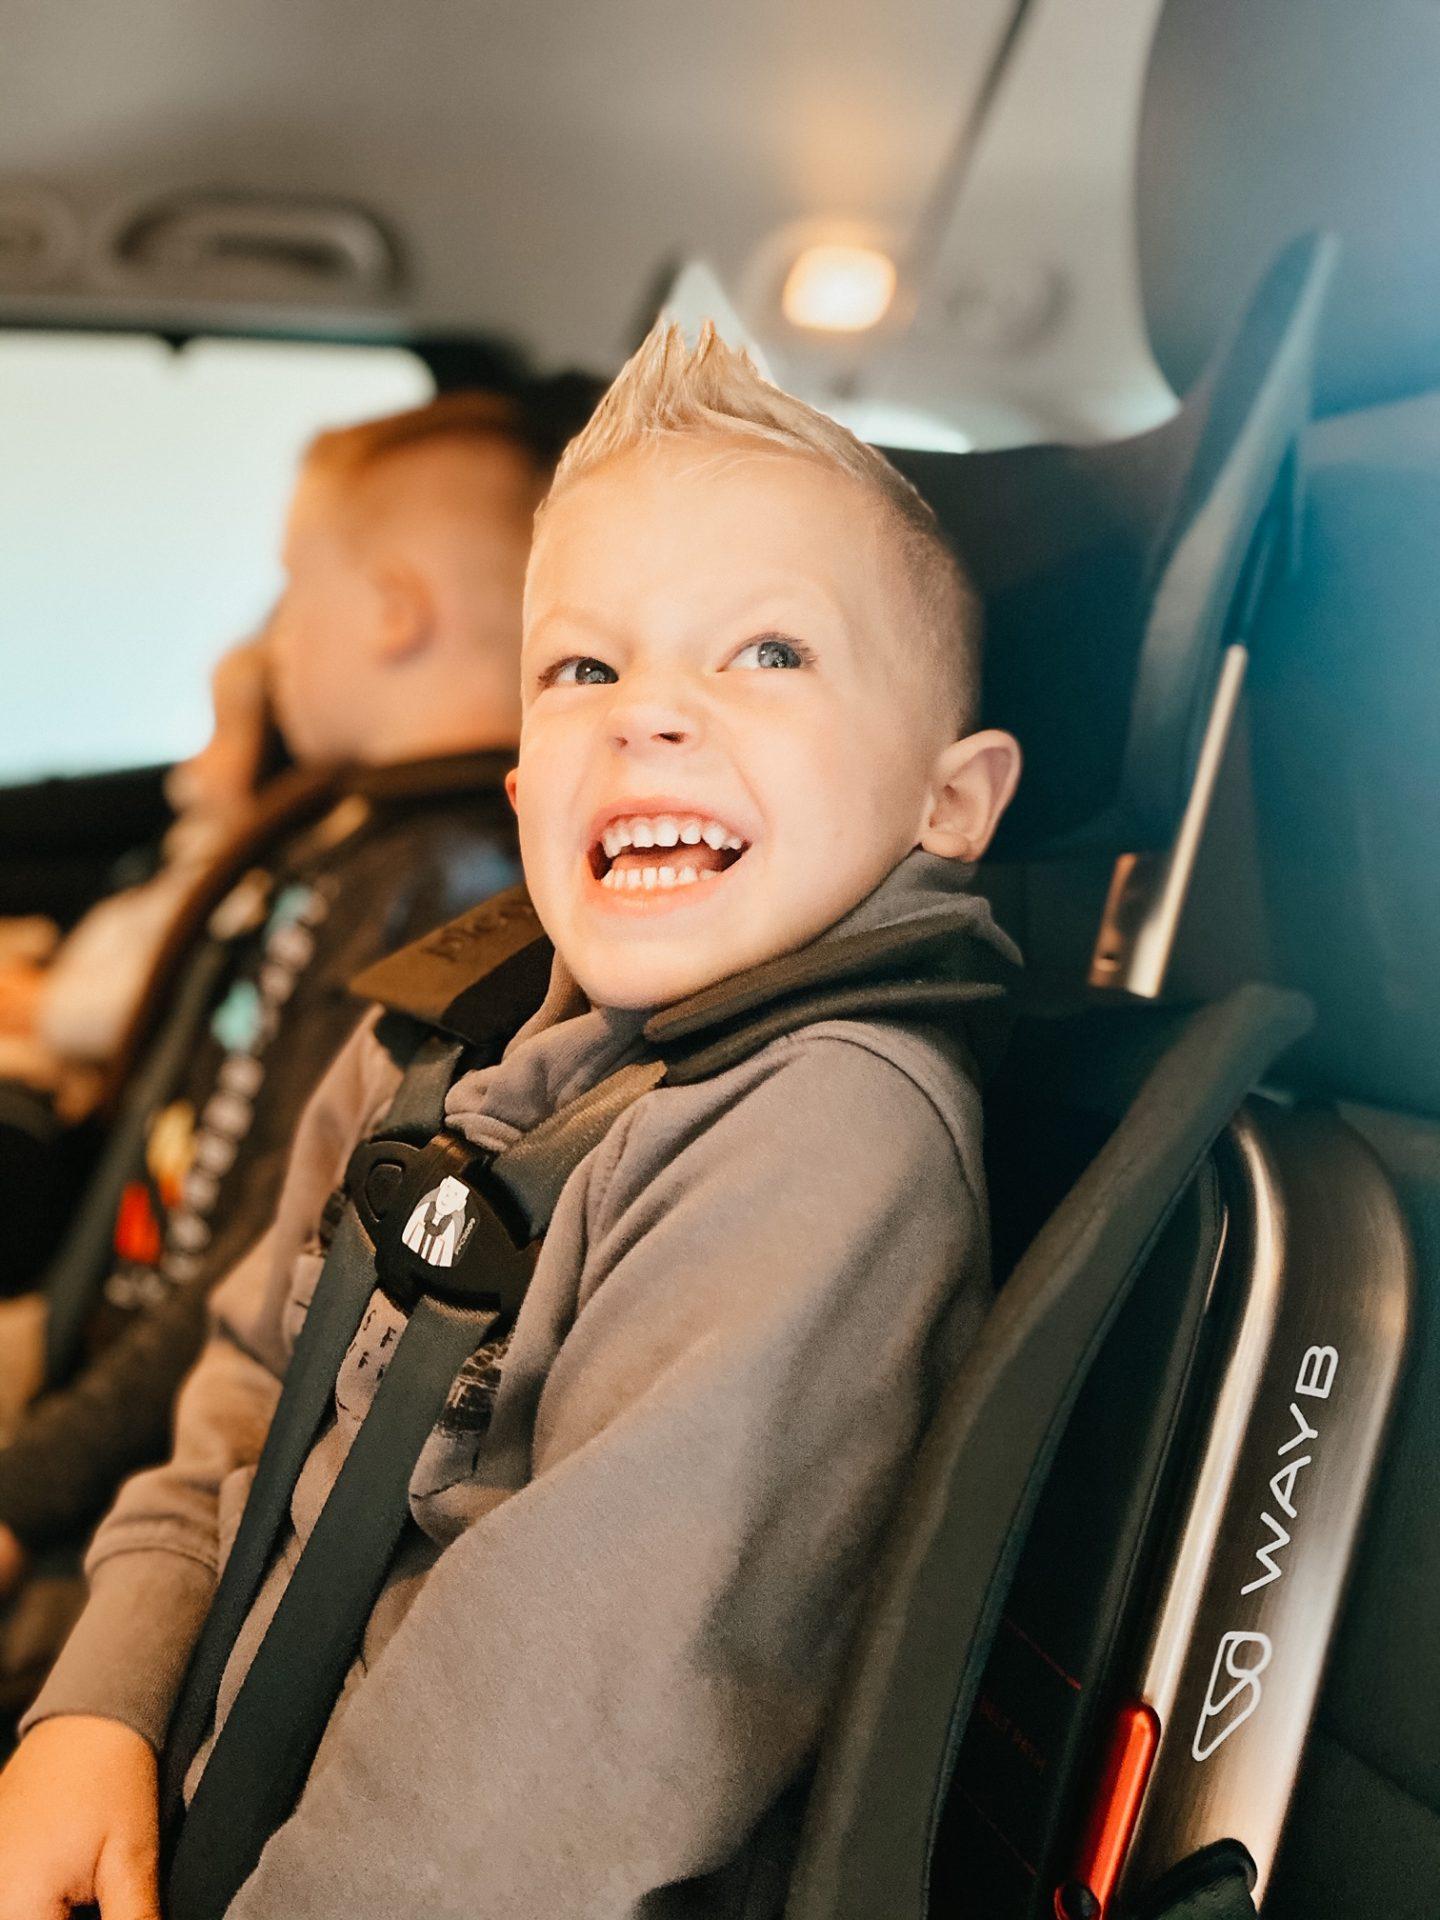 wayb pico car seat specs